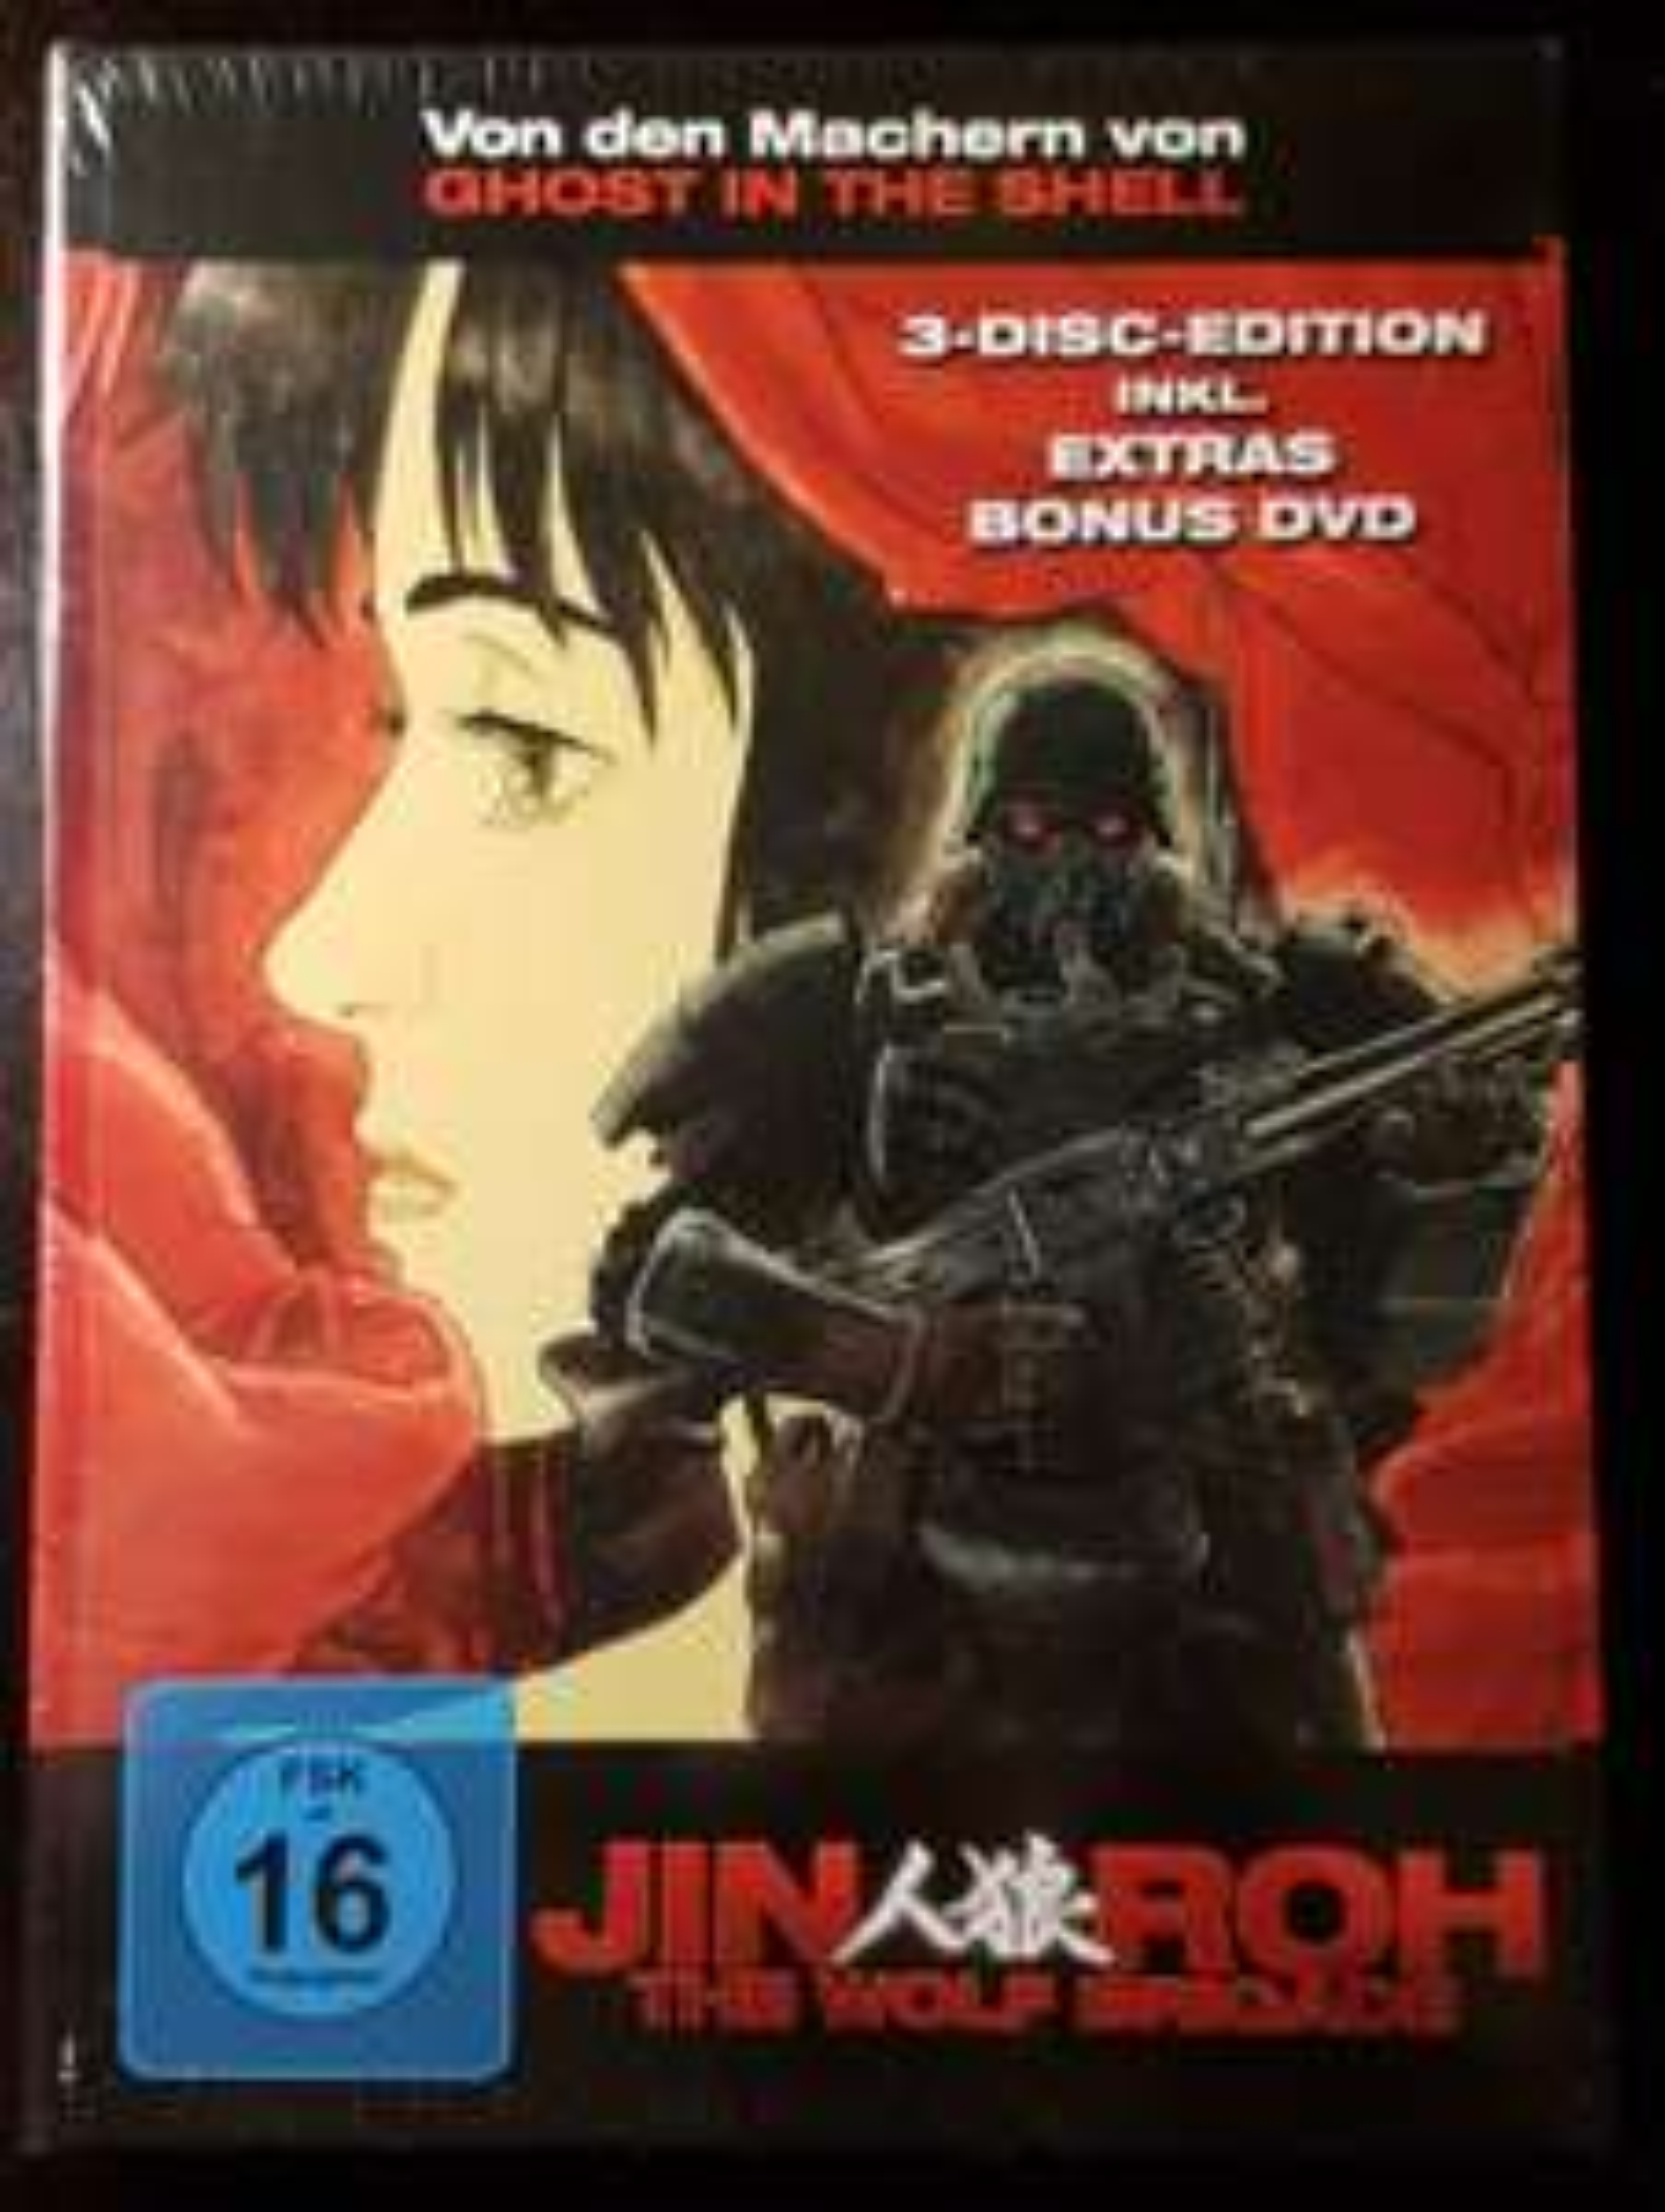 Jin Roh Anime 3 Disc Mediabook 10,87 € inkl. Versandkosten